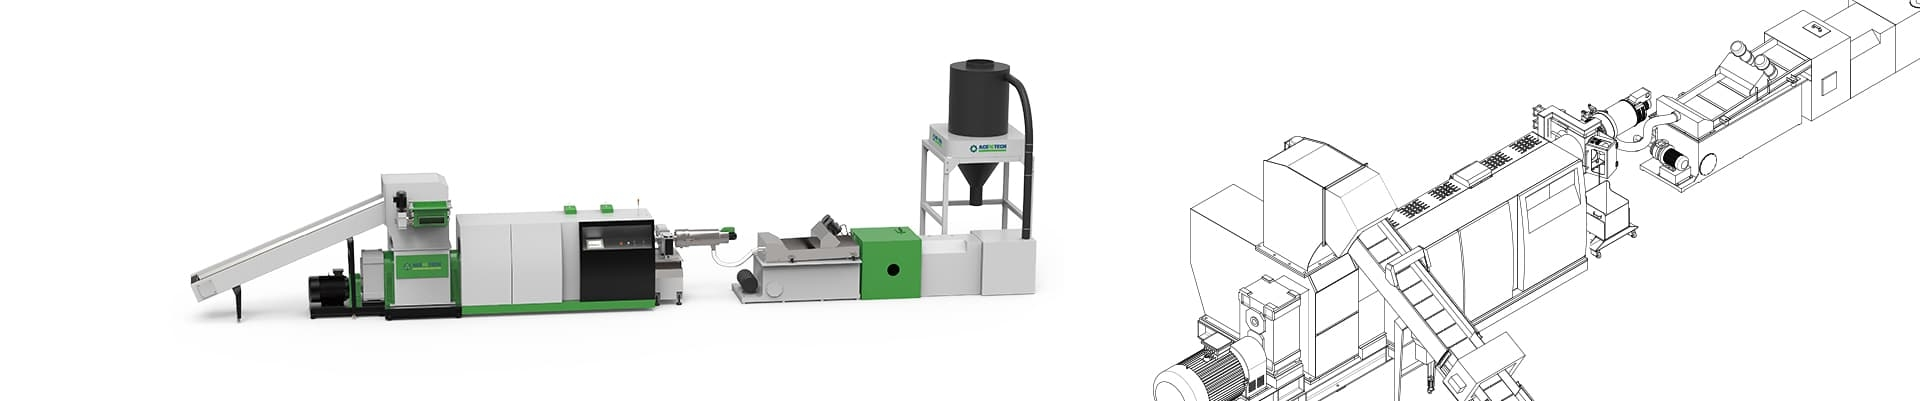 ASP-Mini shredder extruder recycling pelletizing line